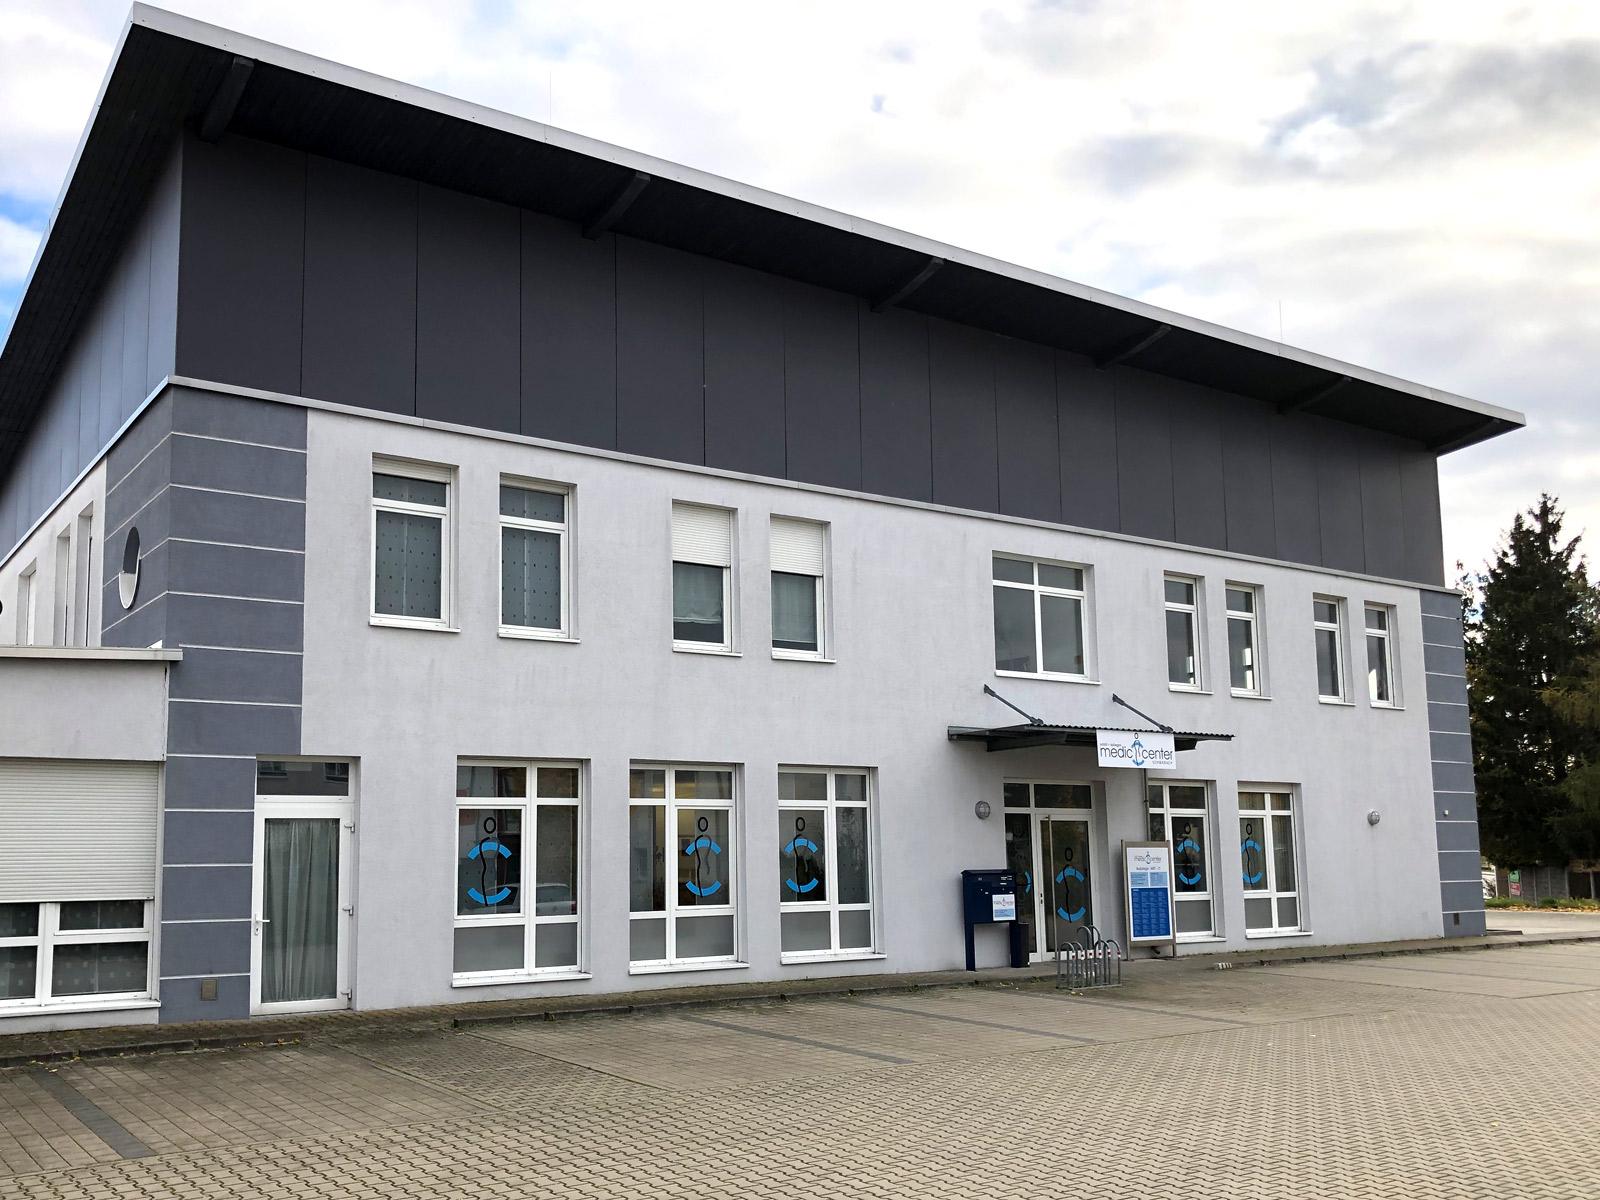 Medic Center Nürnberg in Schwabach